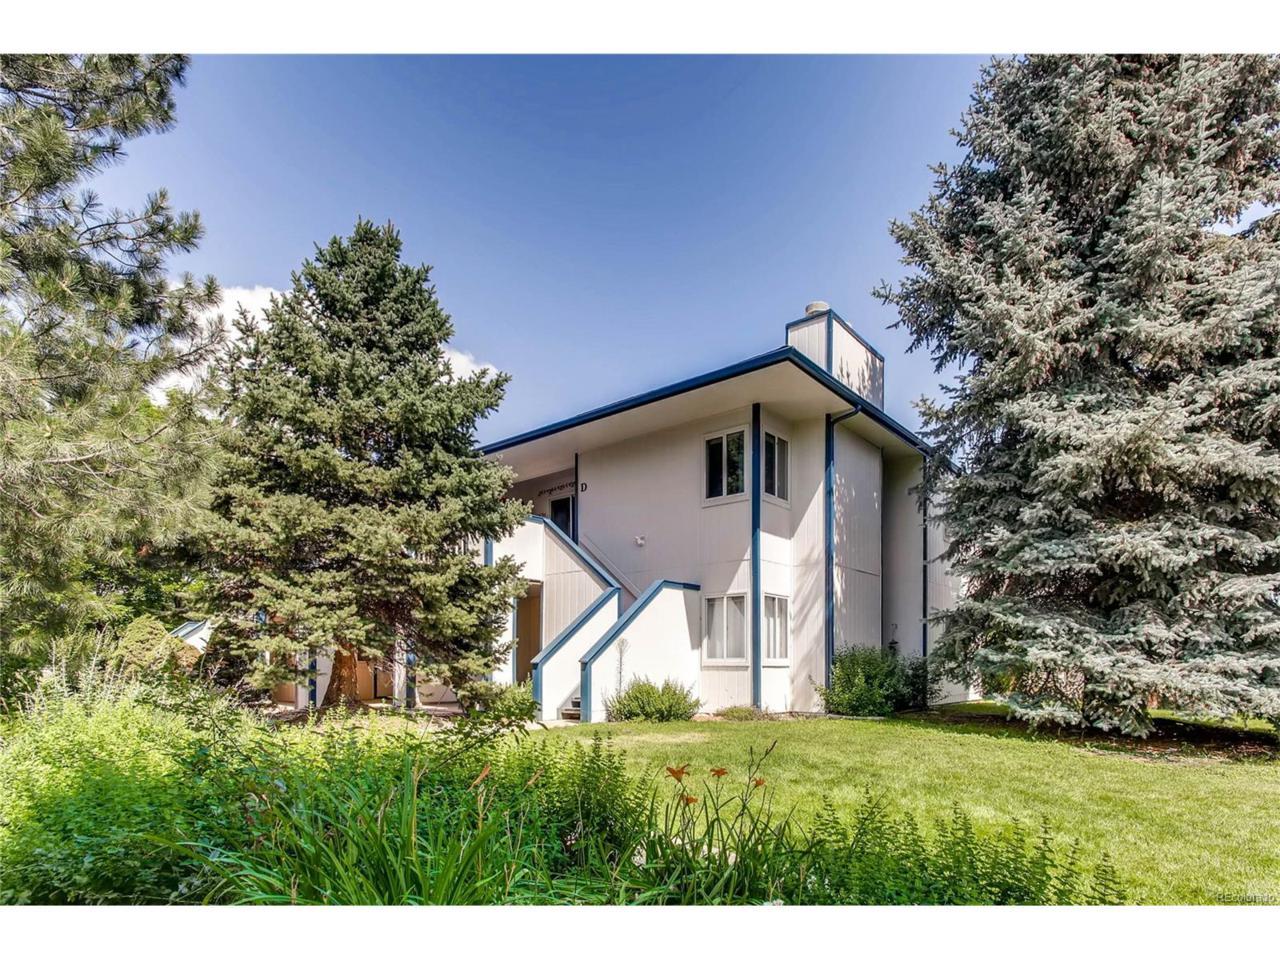 1057 Delta Drive A, Lafayette, CO 80026 (MLS #6685135) :: 8z Real Estate